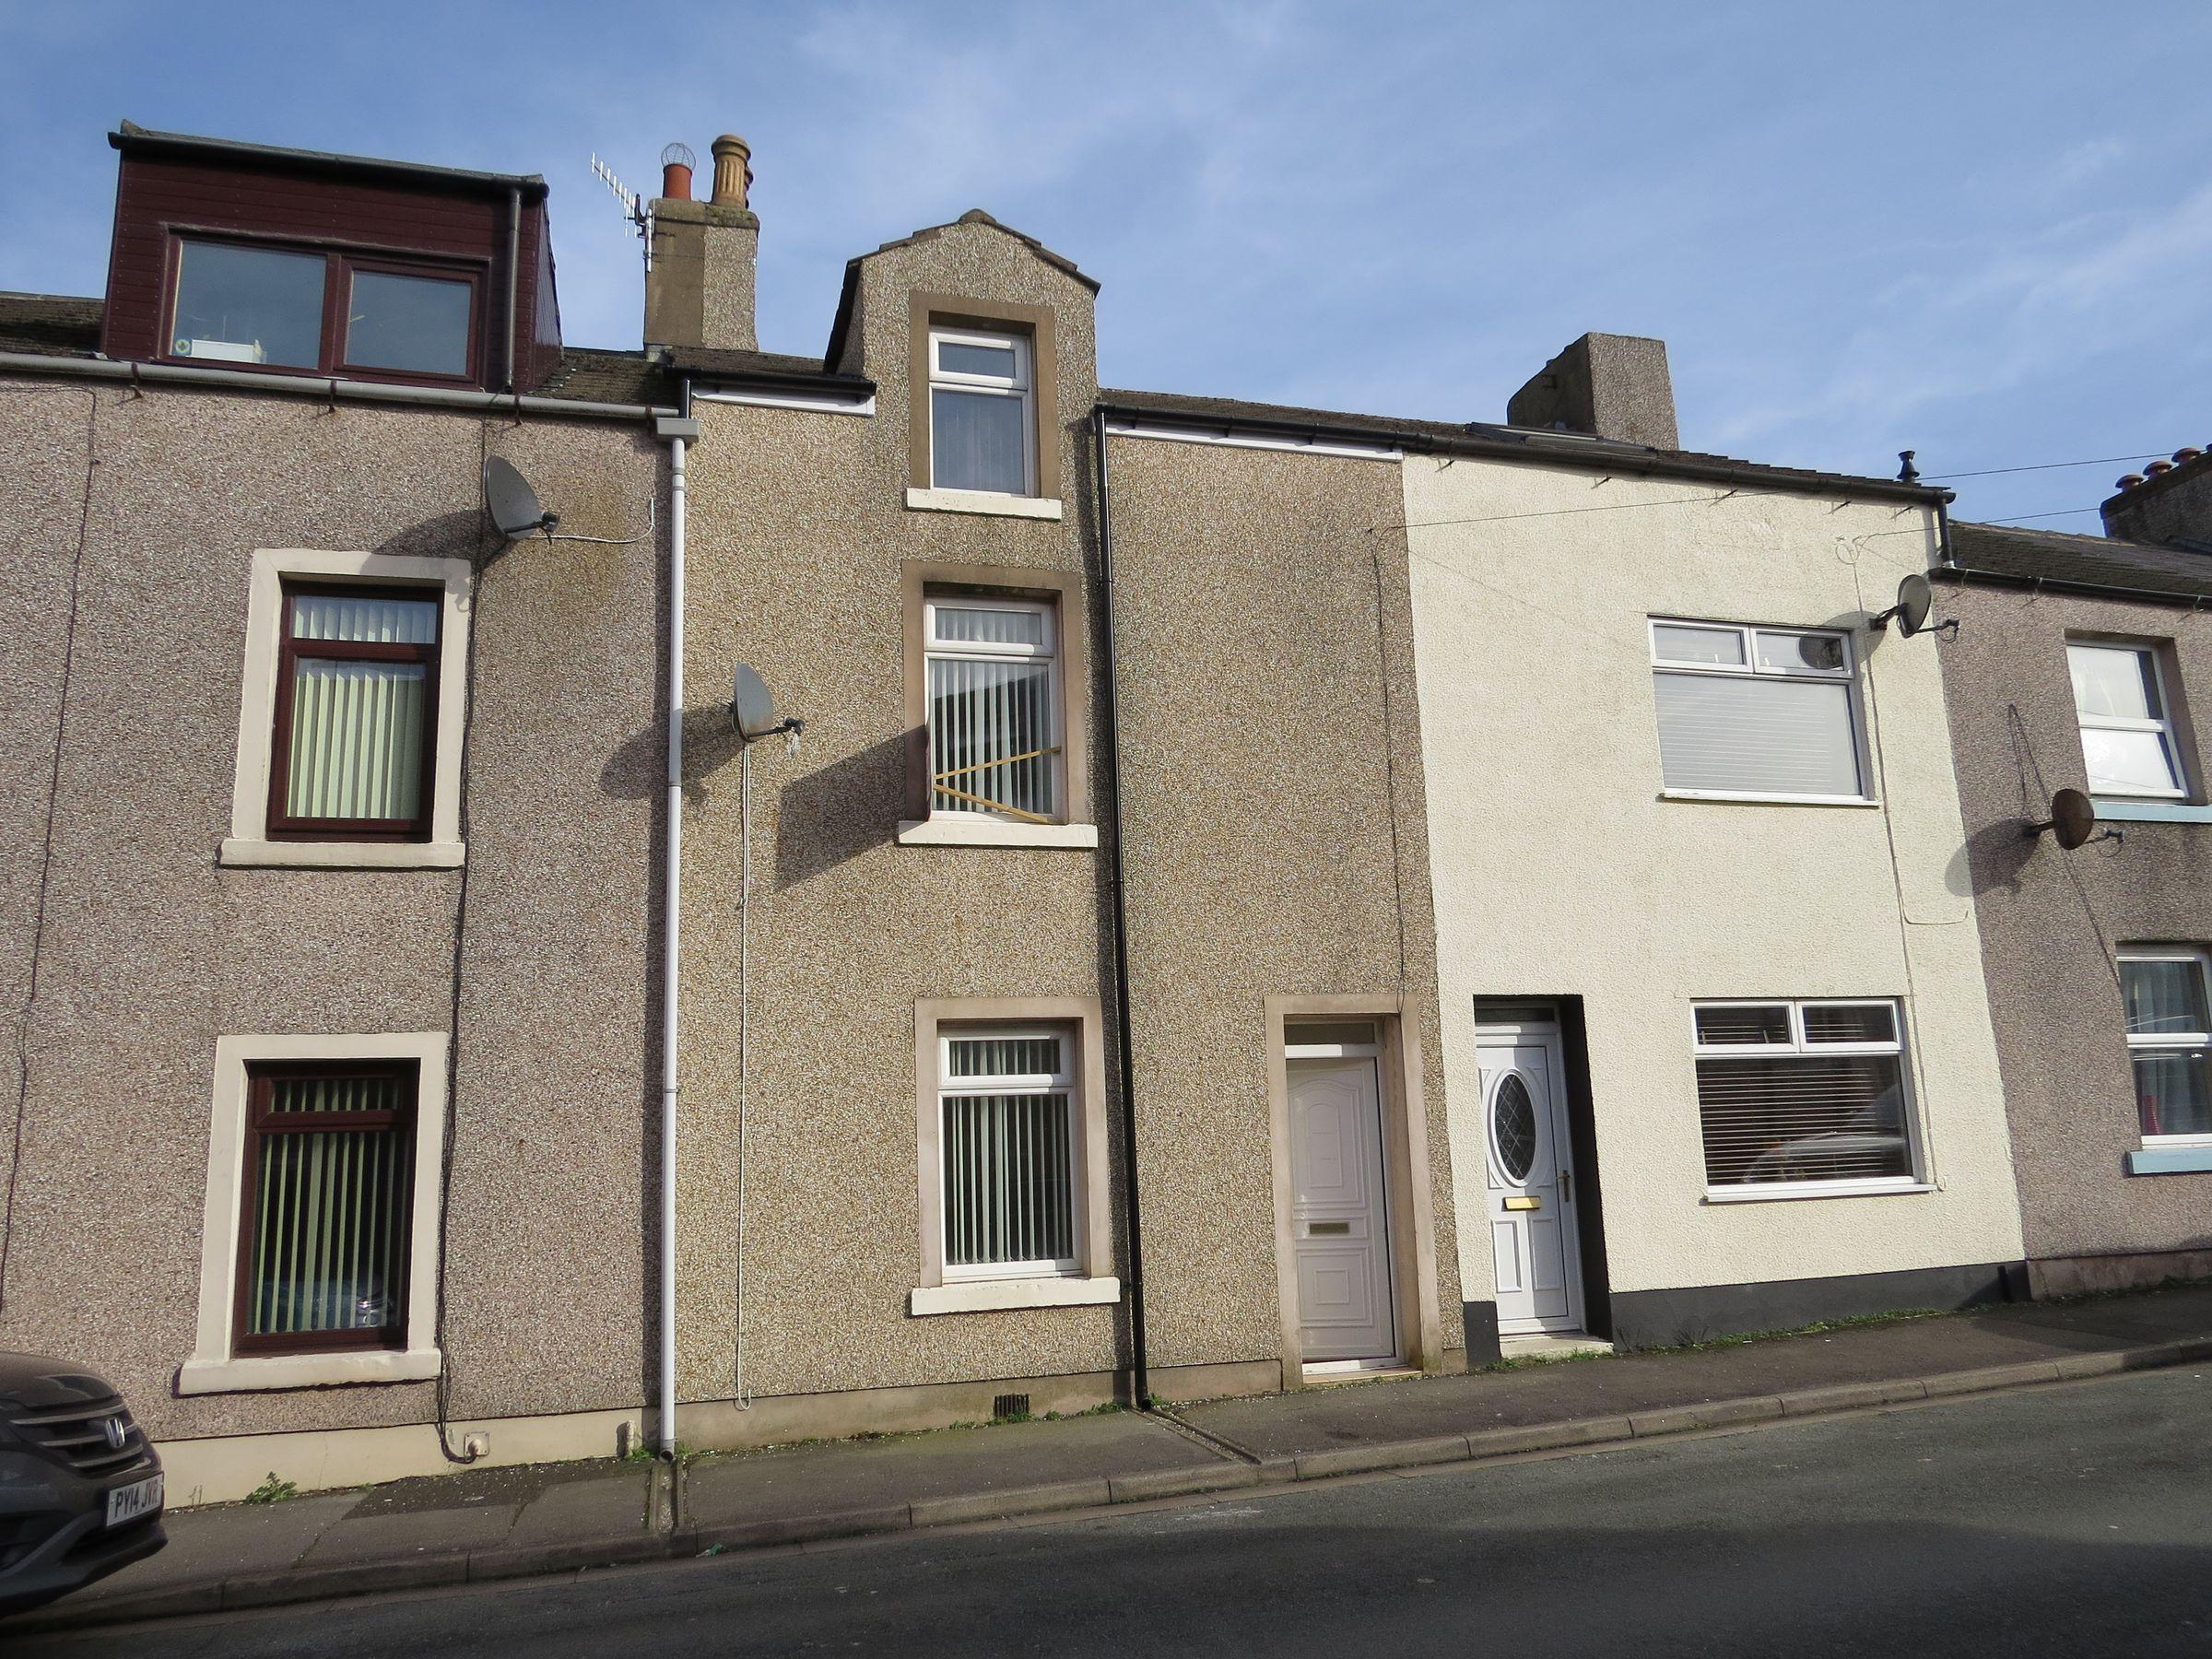 Property photo 1 of 24.